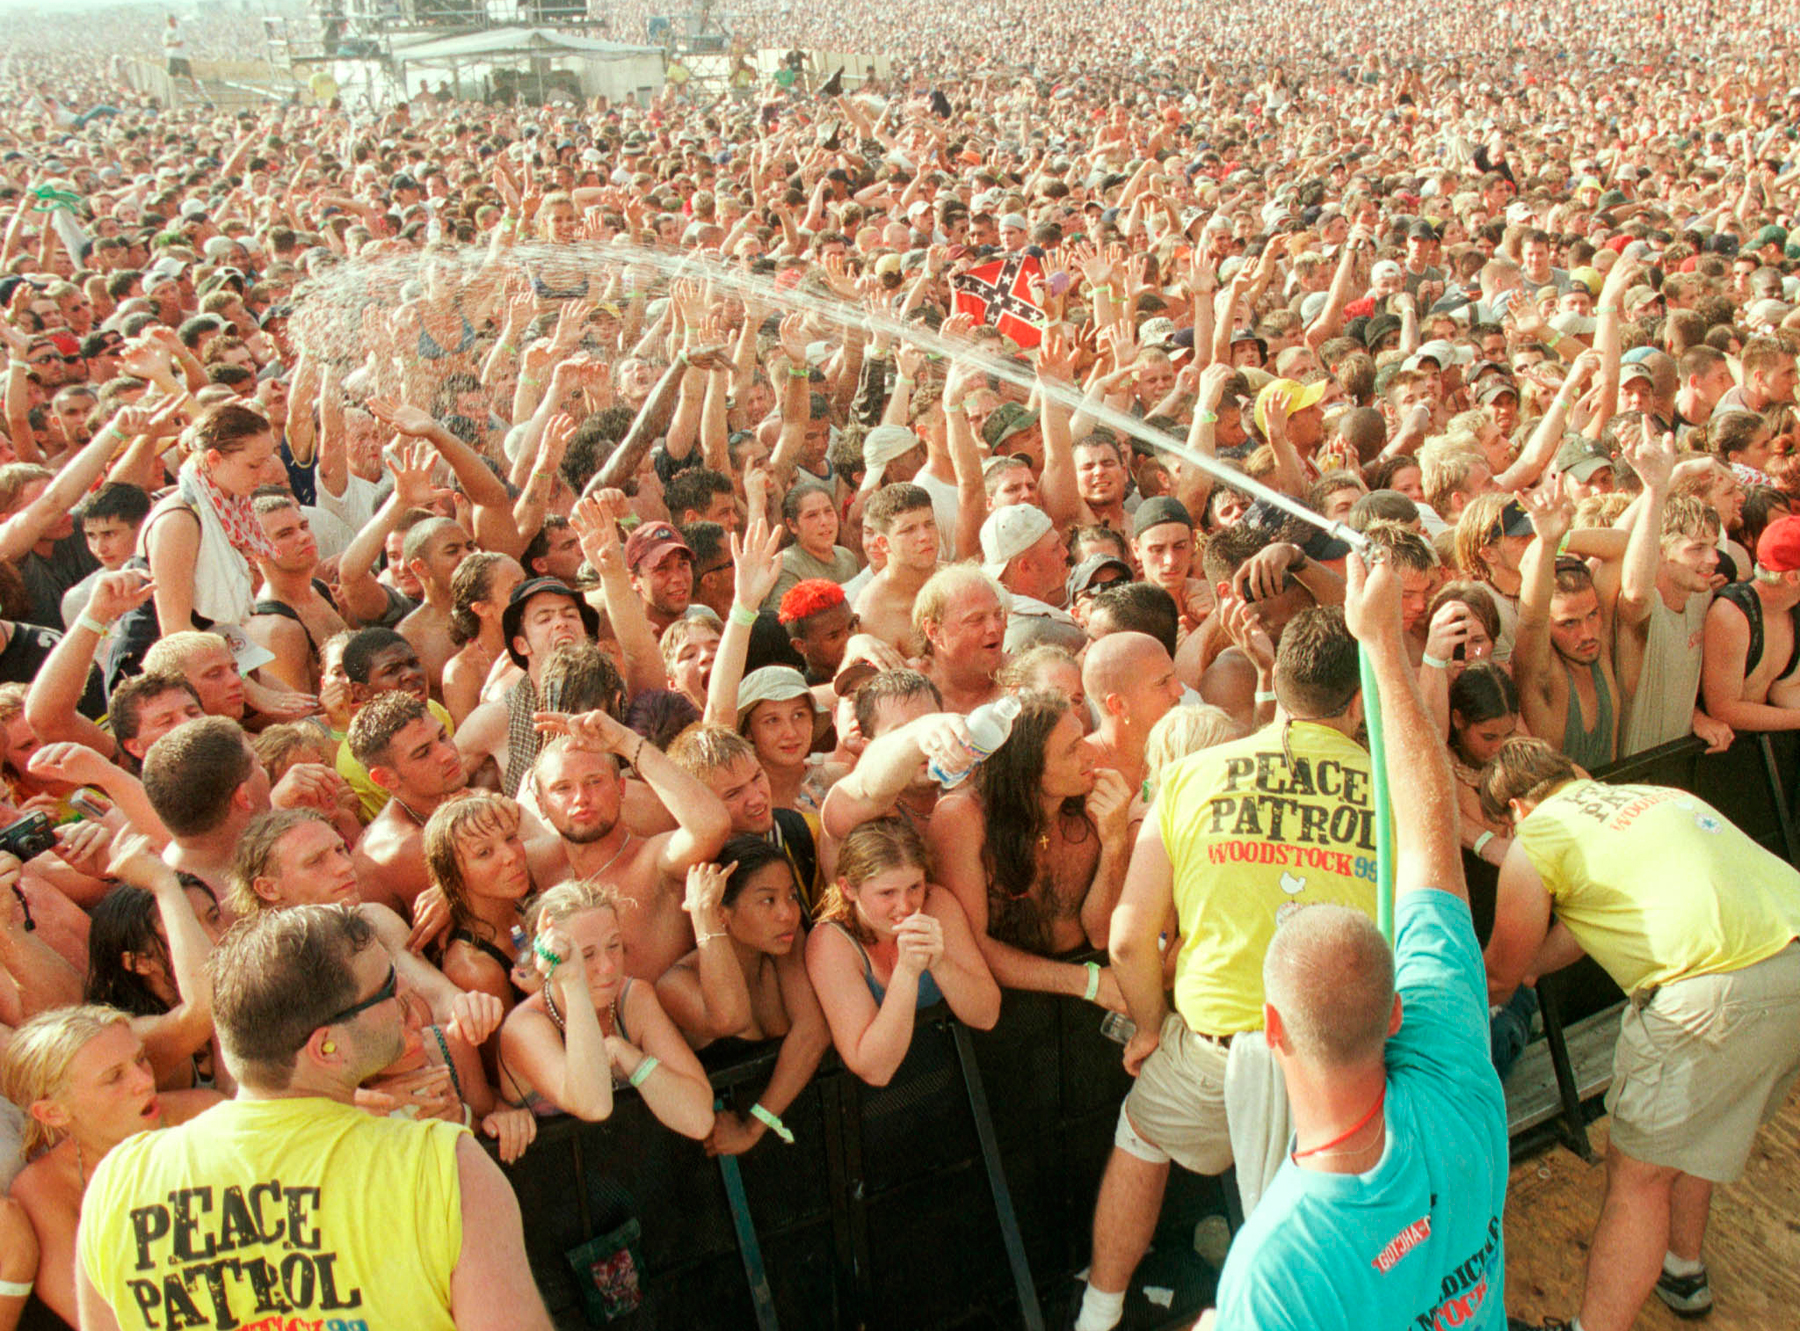 Woodstock '99: Rage Against the Latrine